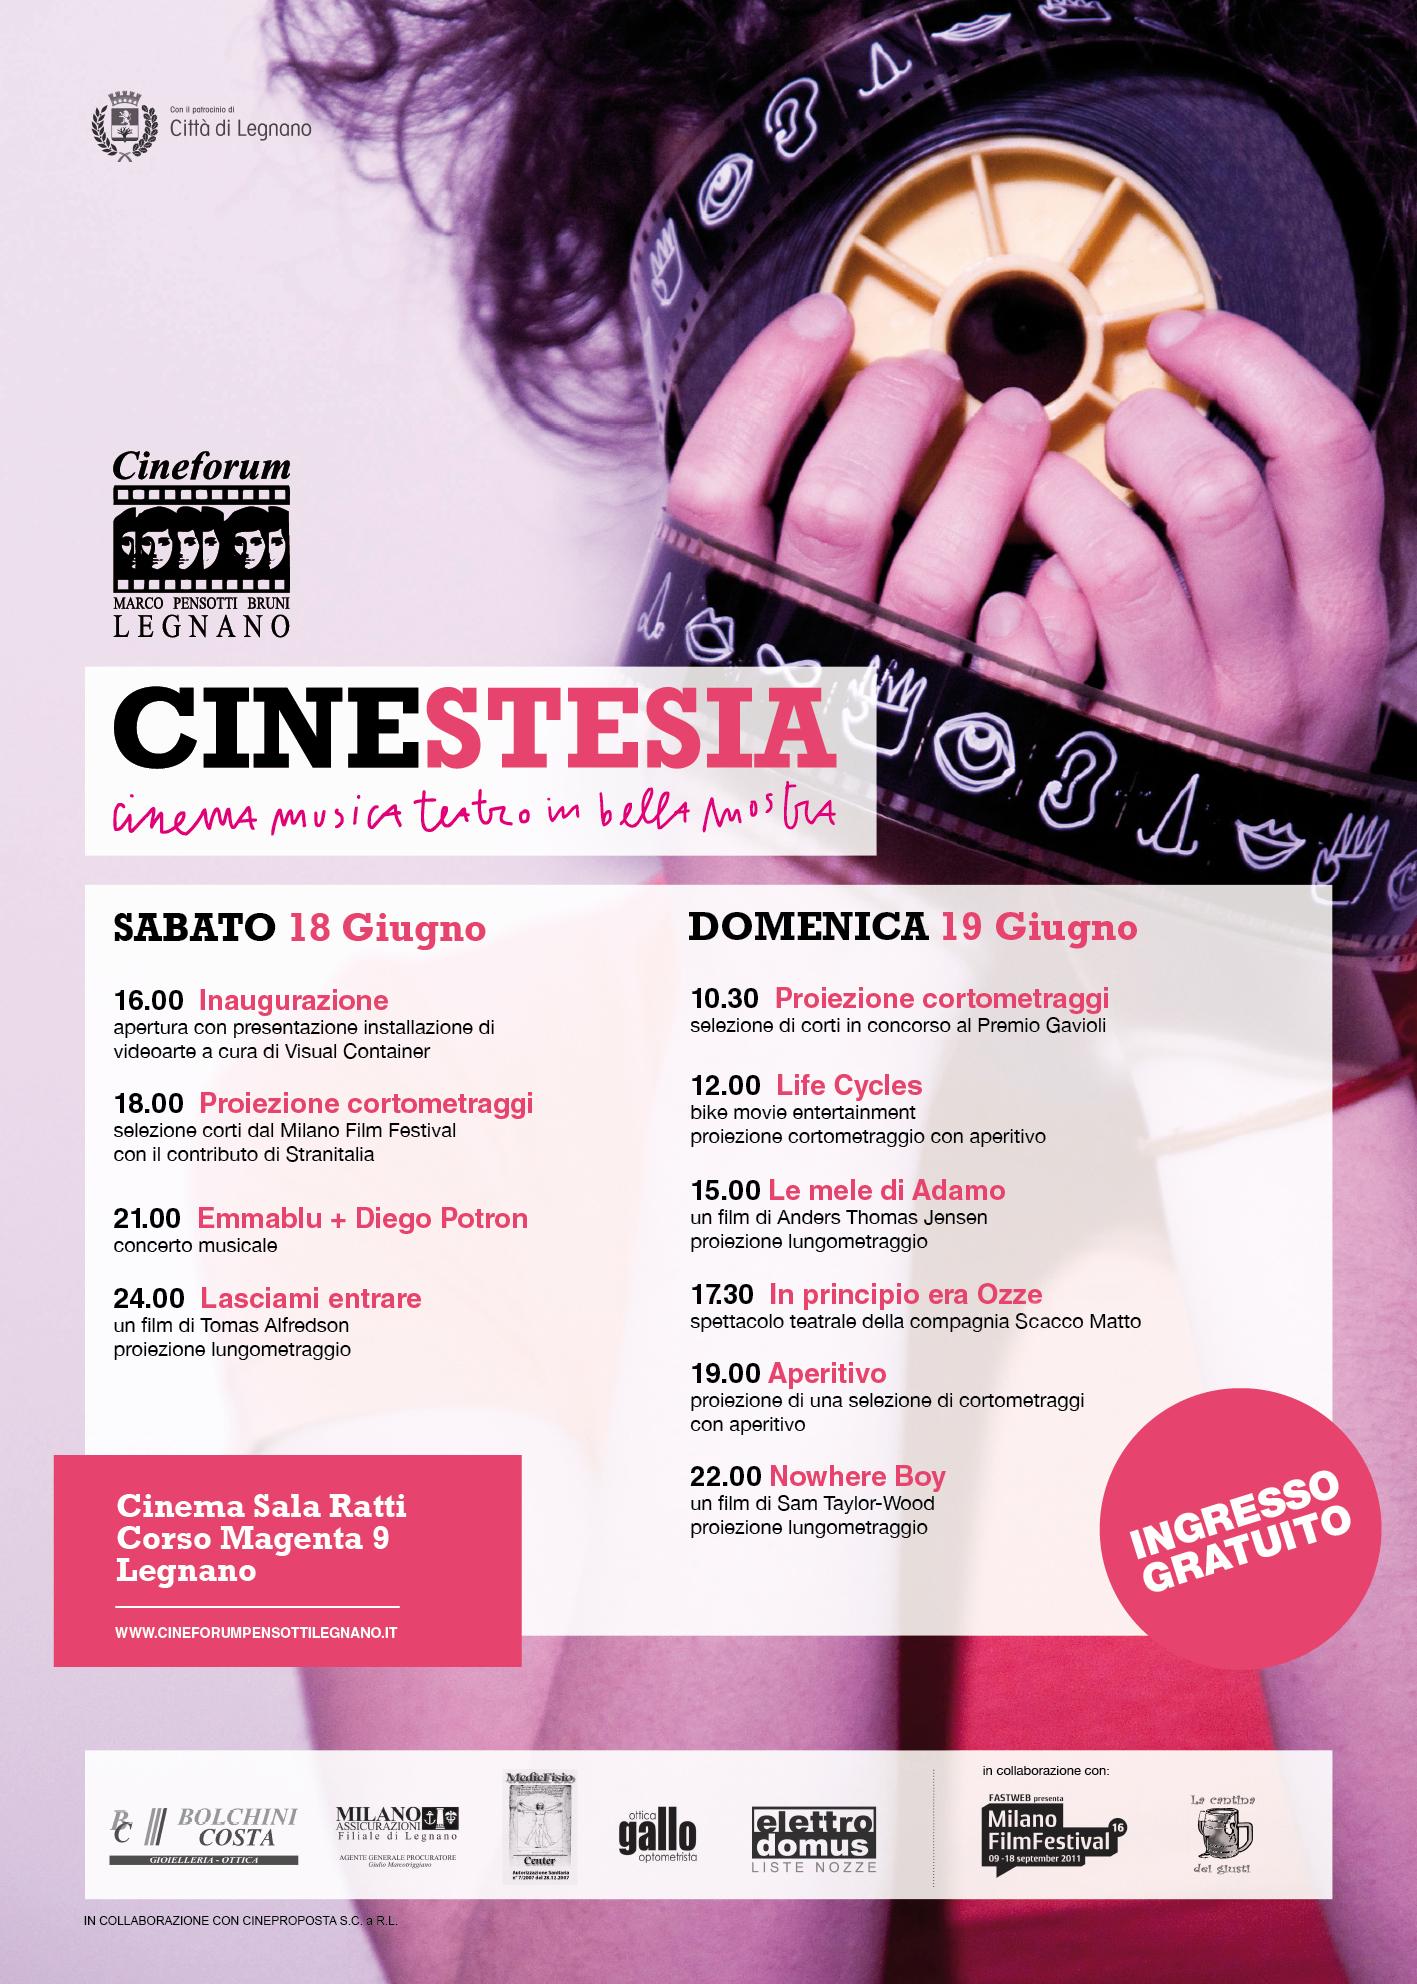 Locandina Cinestesia 2011